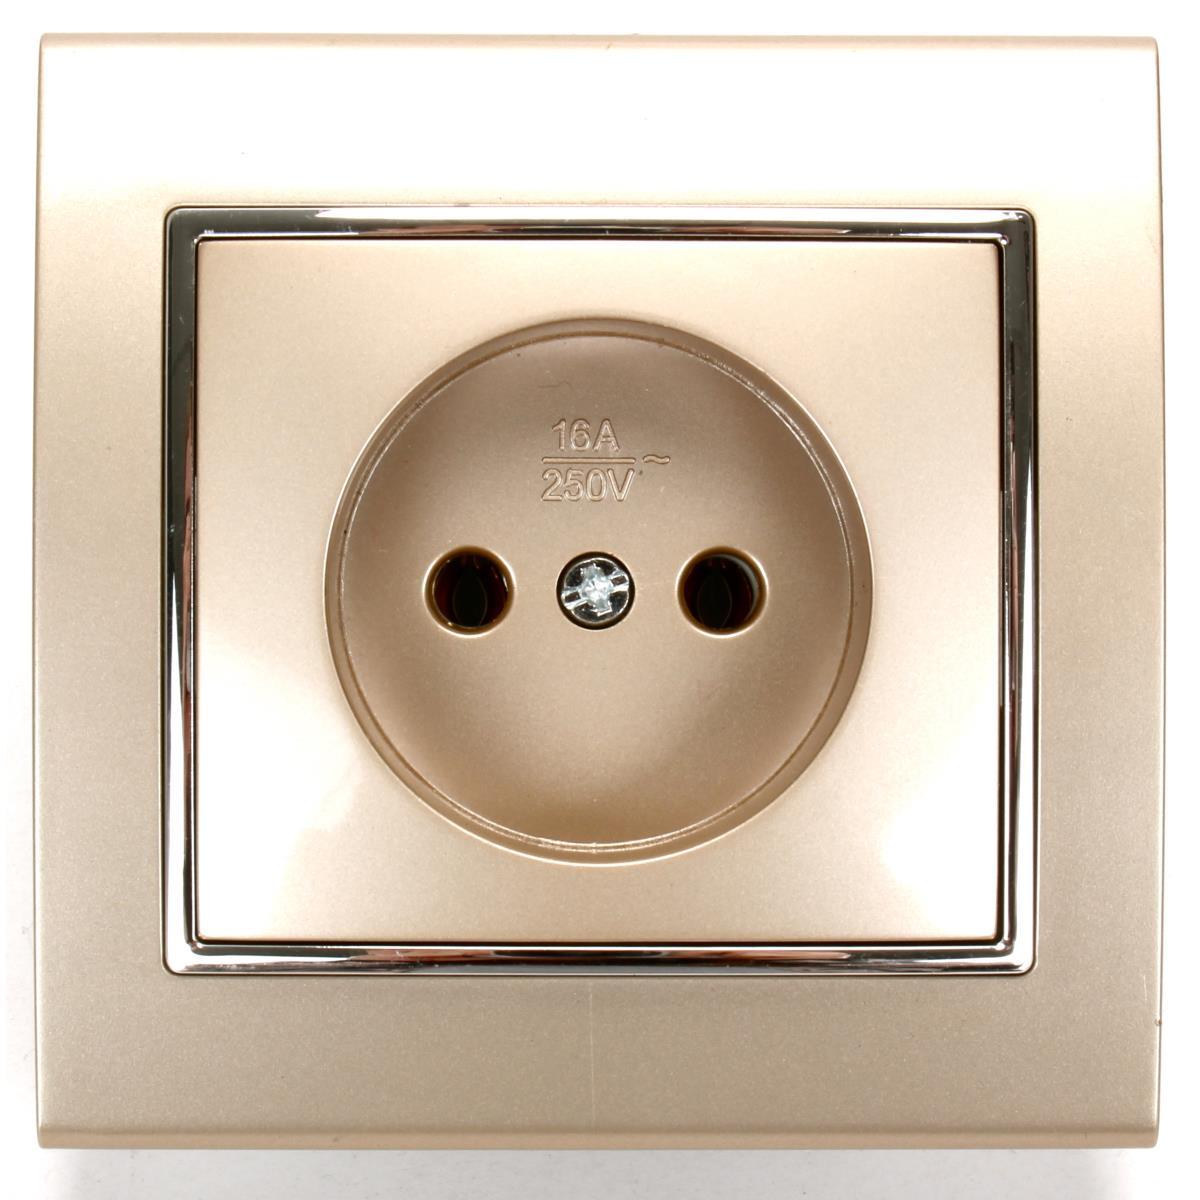 lichtschalter serienschalter dimmer steckdose farbe champagner silber ebay. Black Bedroom Furniture Sets. Home Design Ideas